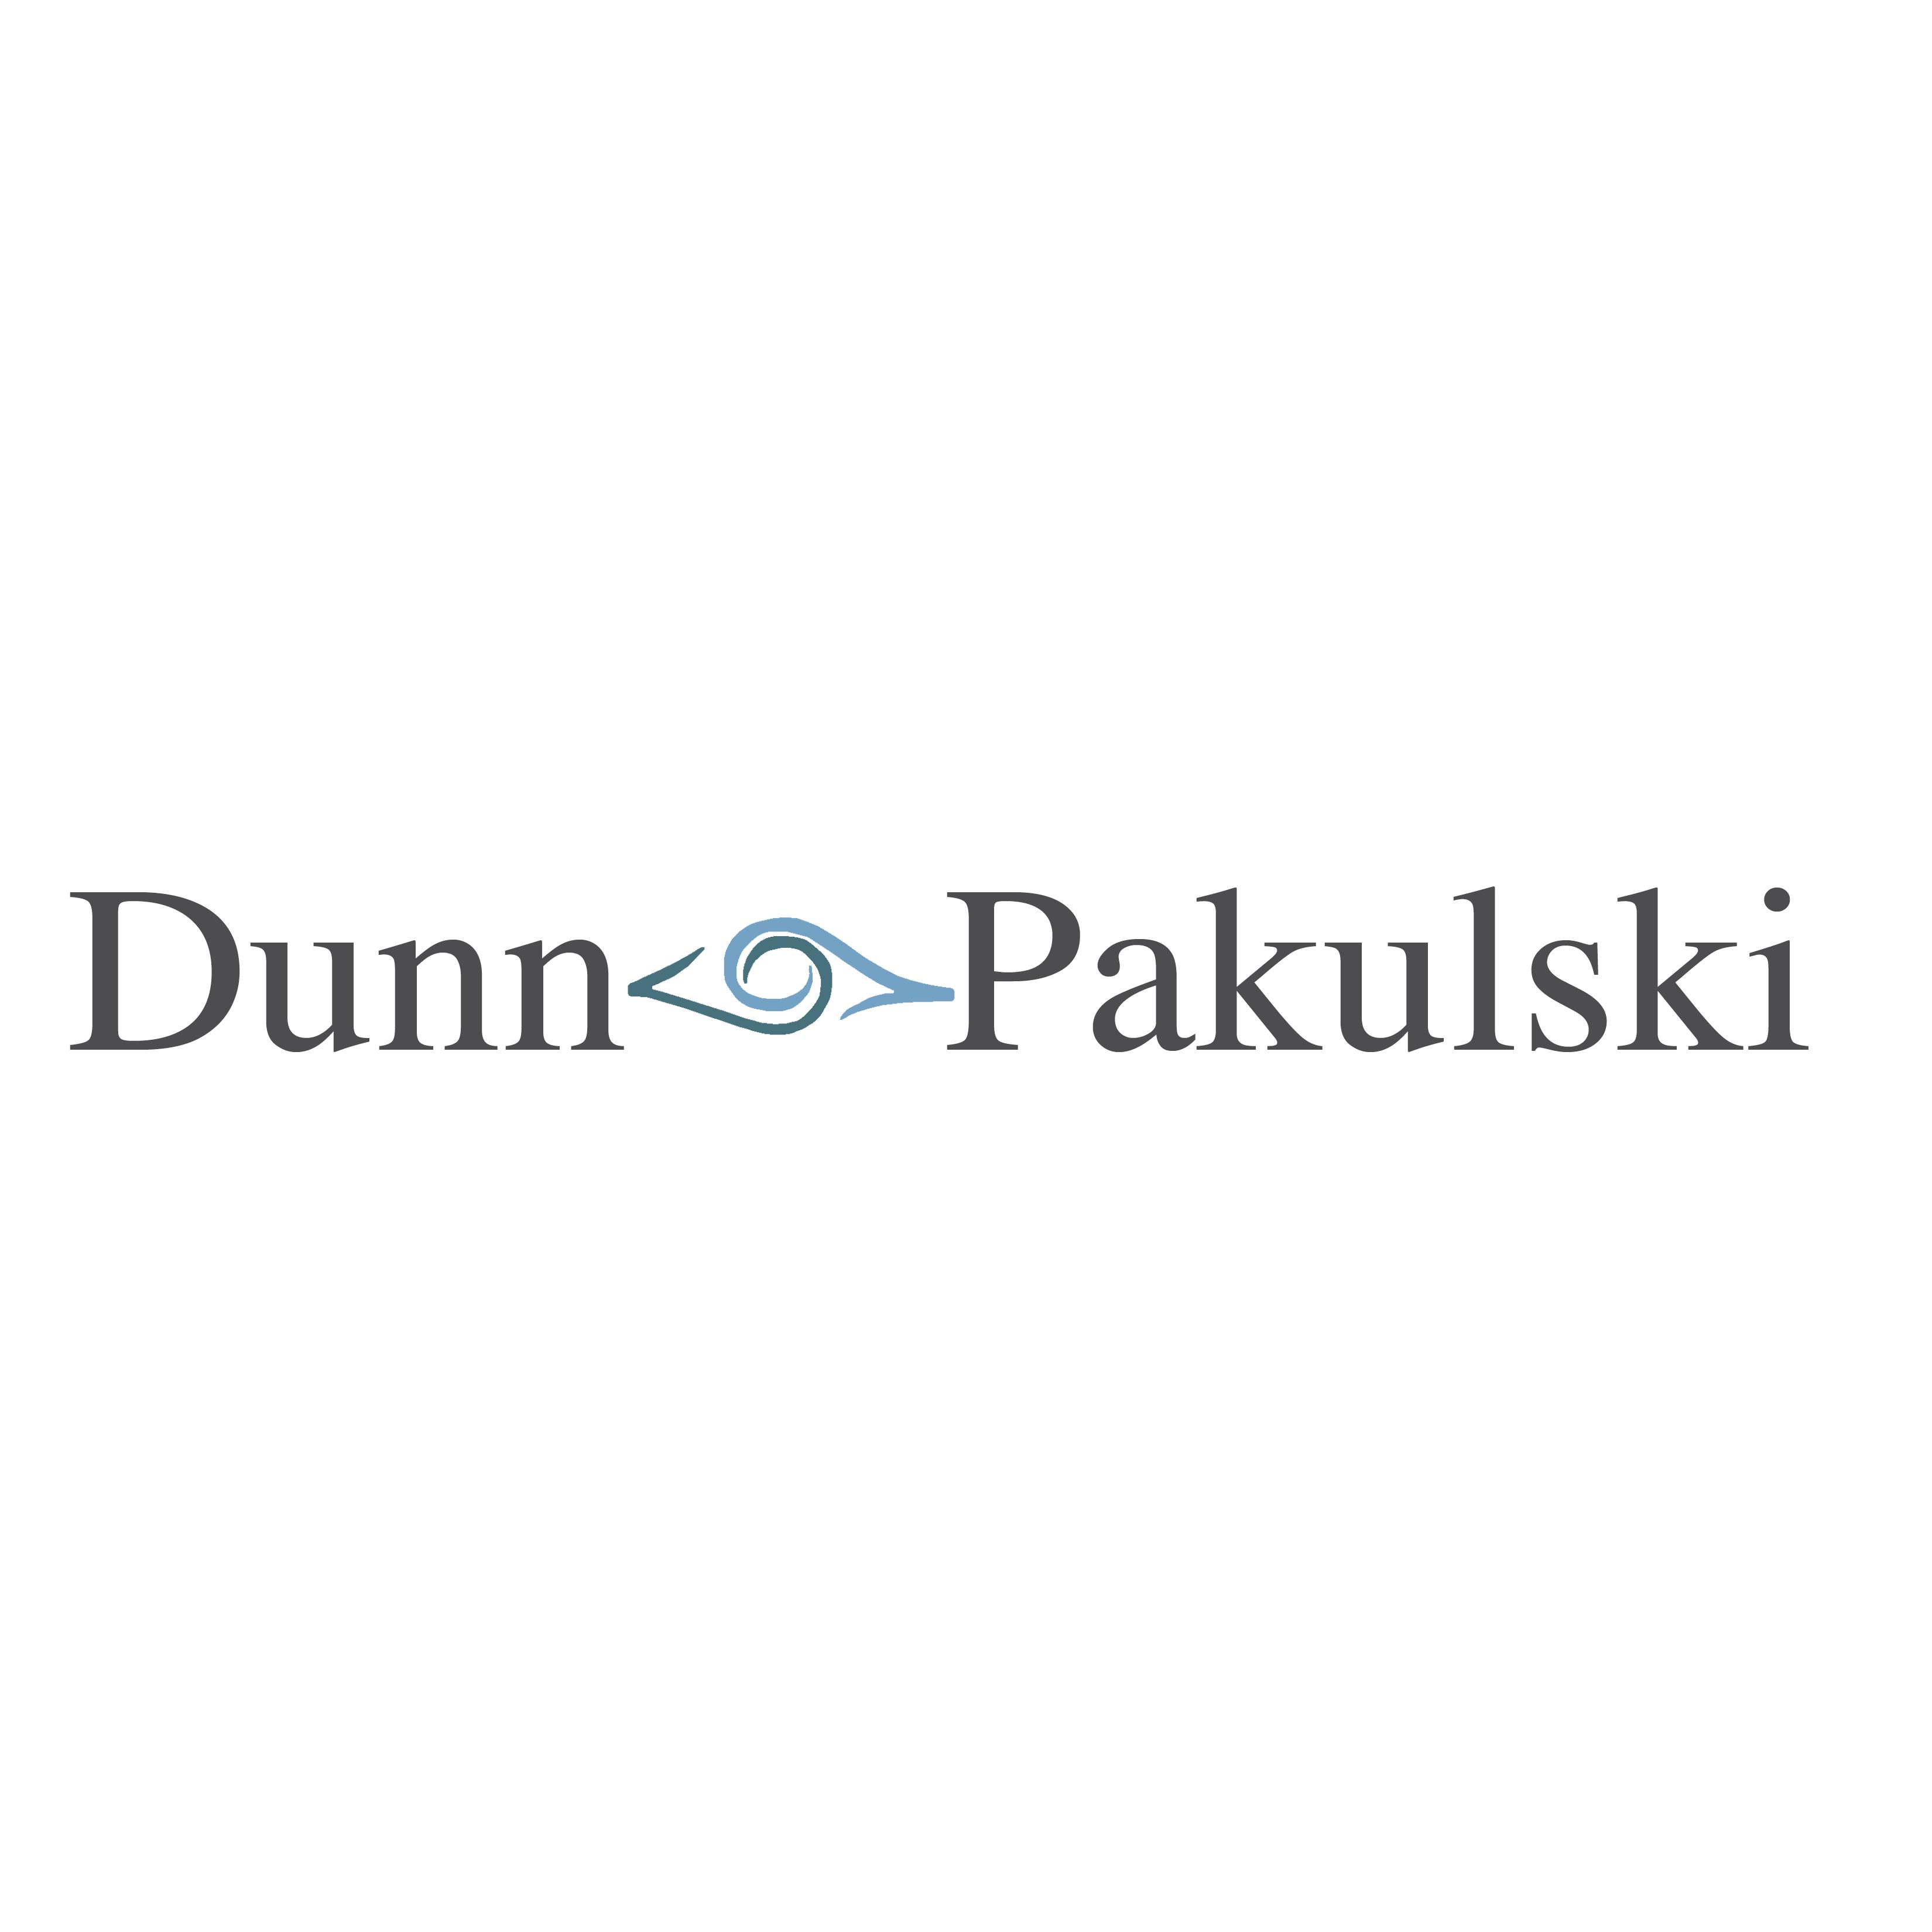 Dunn & Pakulski, Optometrists - Skowhegan, ME - Optometrists